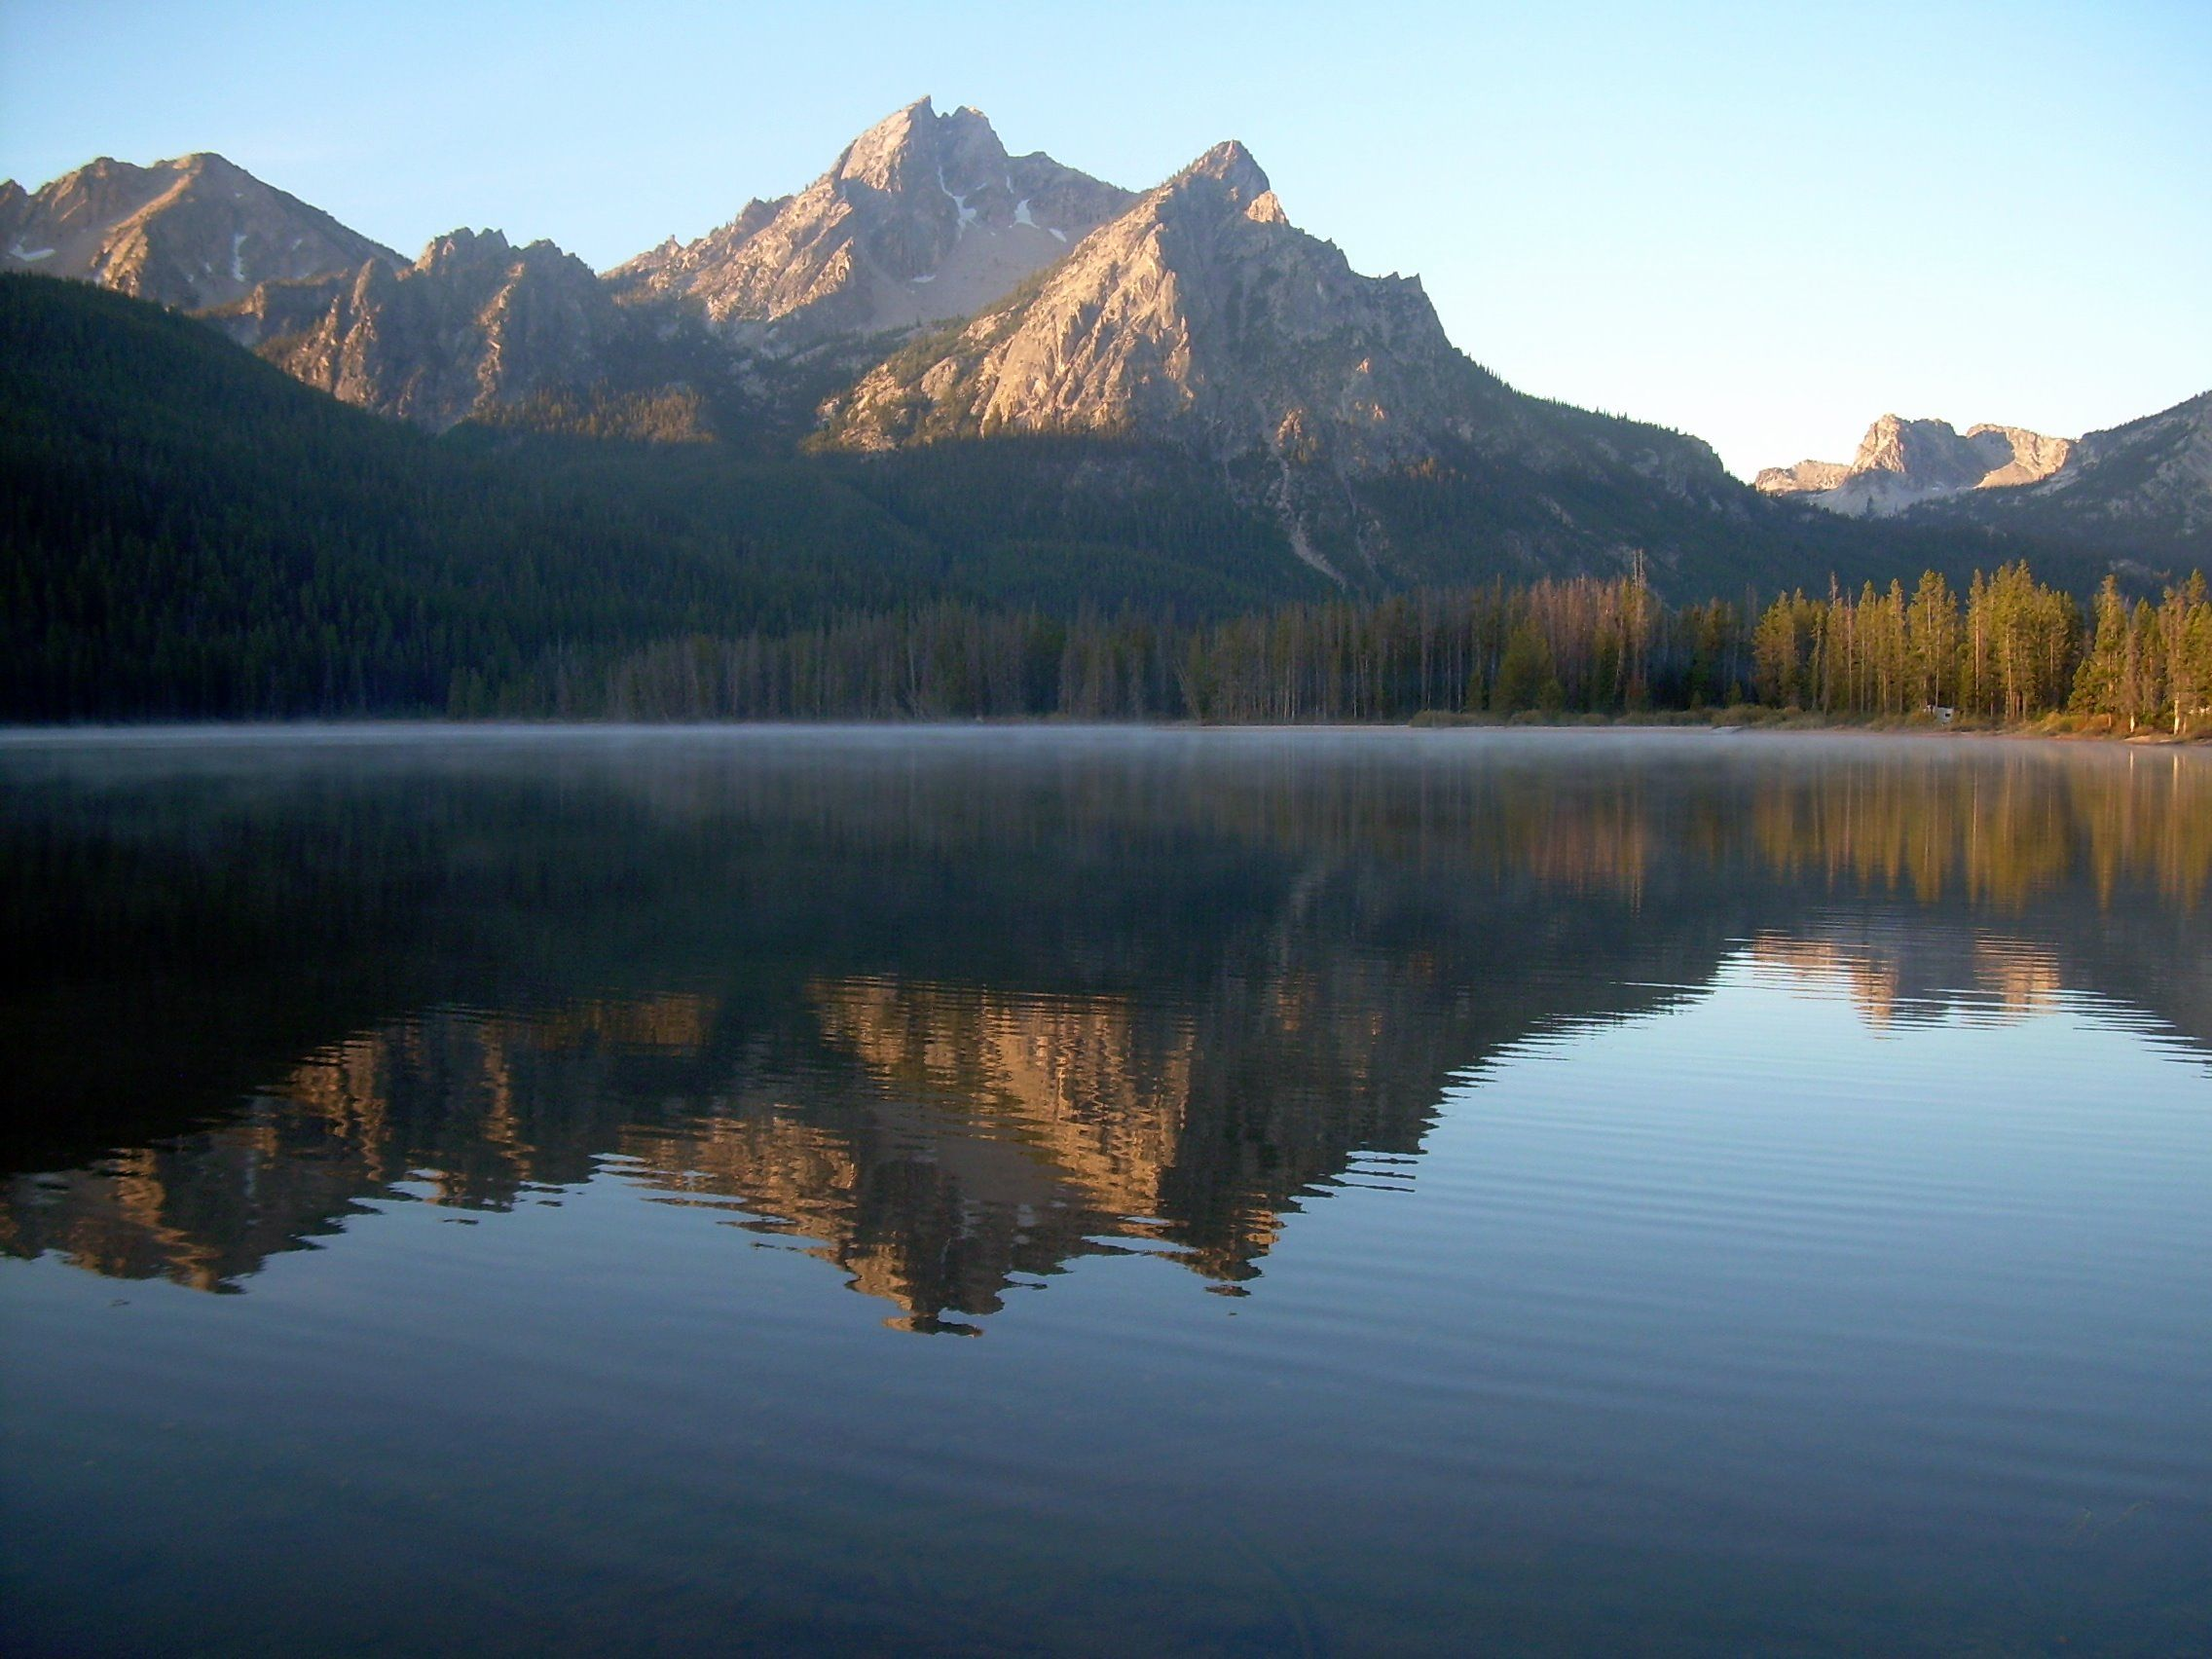 Idahos stanley lake canyon county natural landmarks